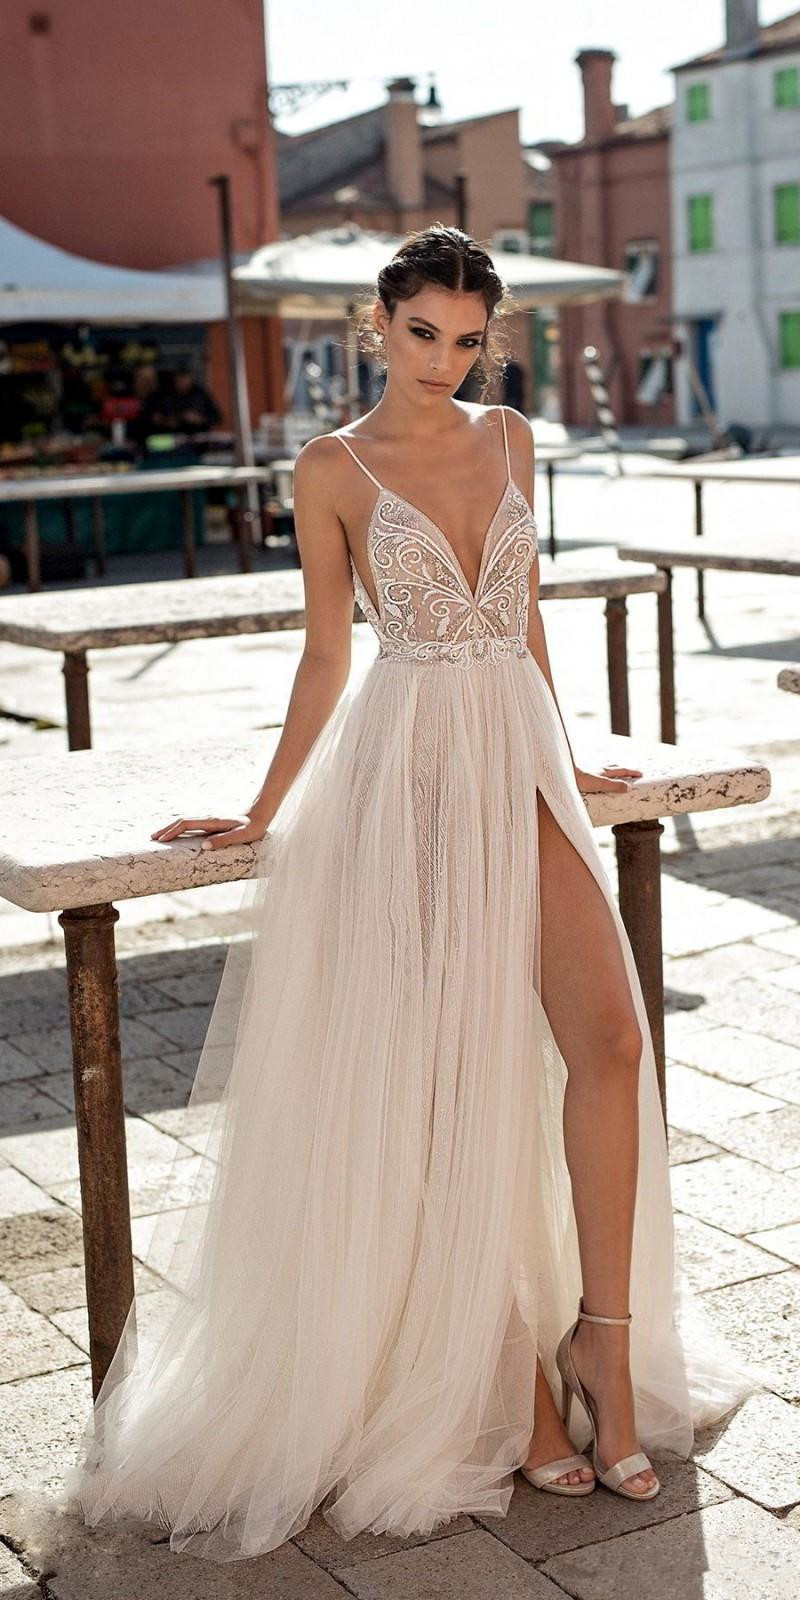 gali-karten-2019-beach-wedding-dresses-side-split-spaghetti-sexy-illusion-boho-a-line-wedding-dresses-pearls-backless-bohemian-bridal-gowns (2)